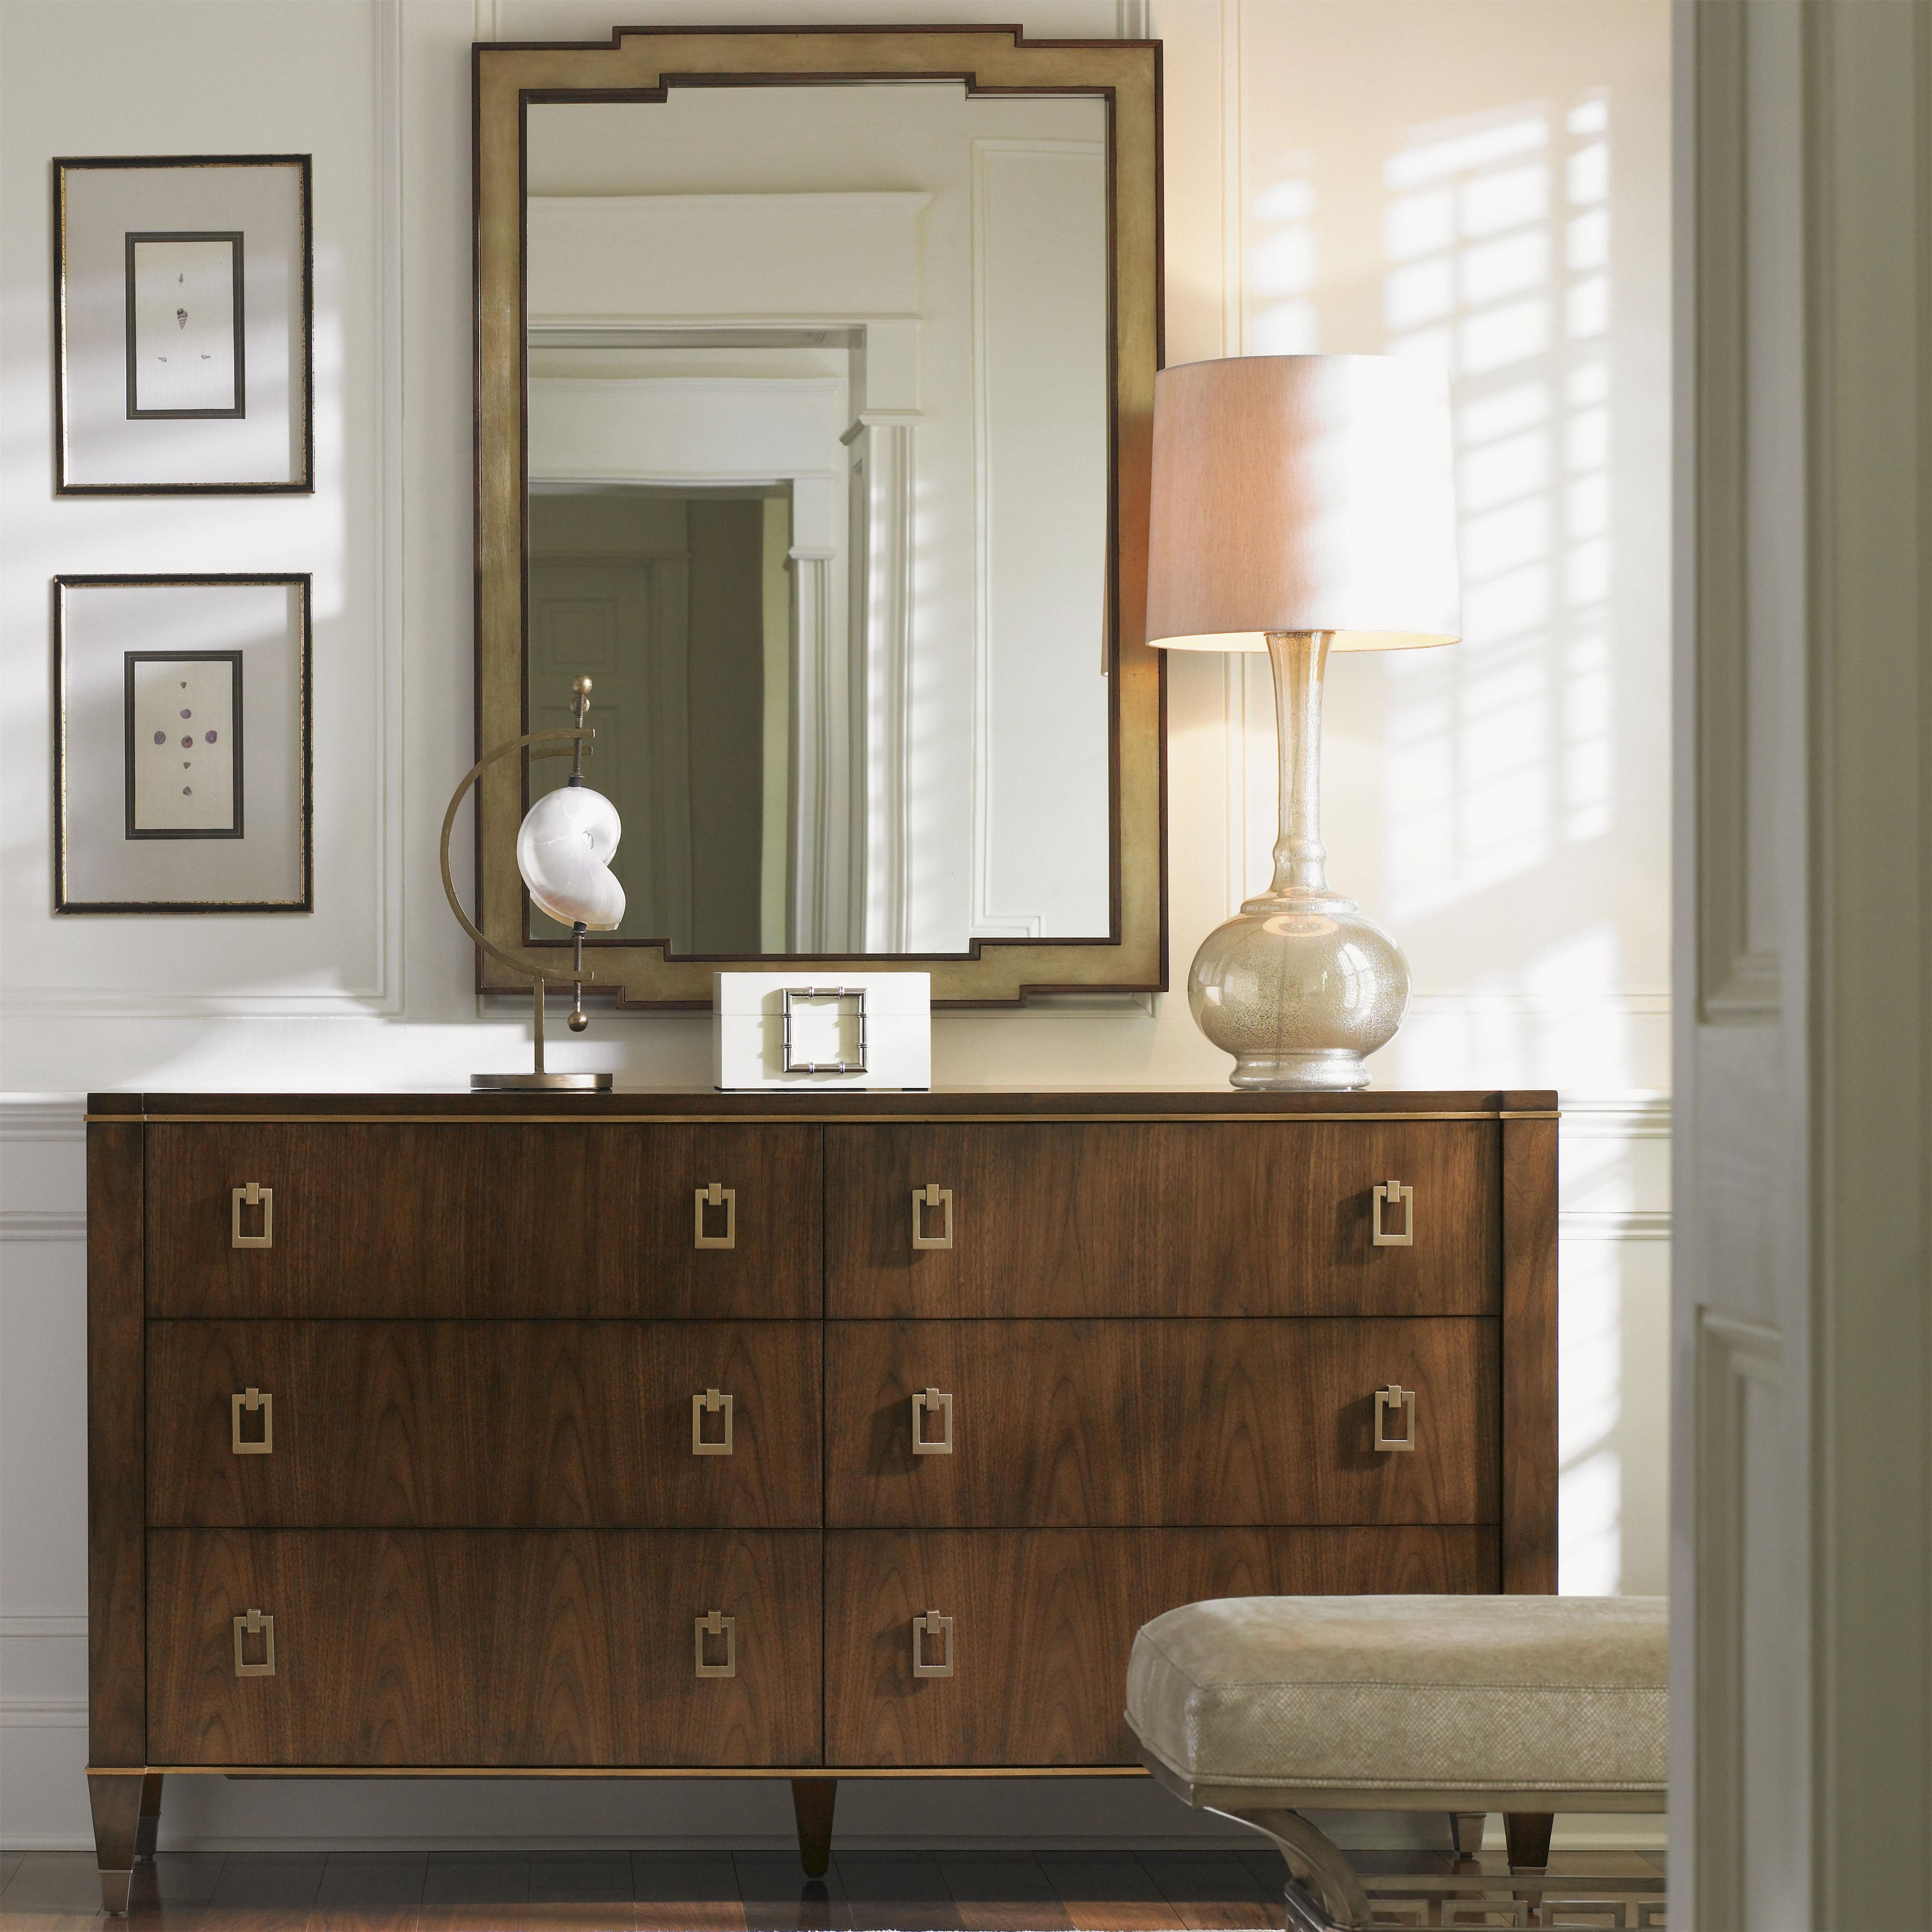 Madison Dresser and Glencoe Mirror